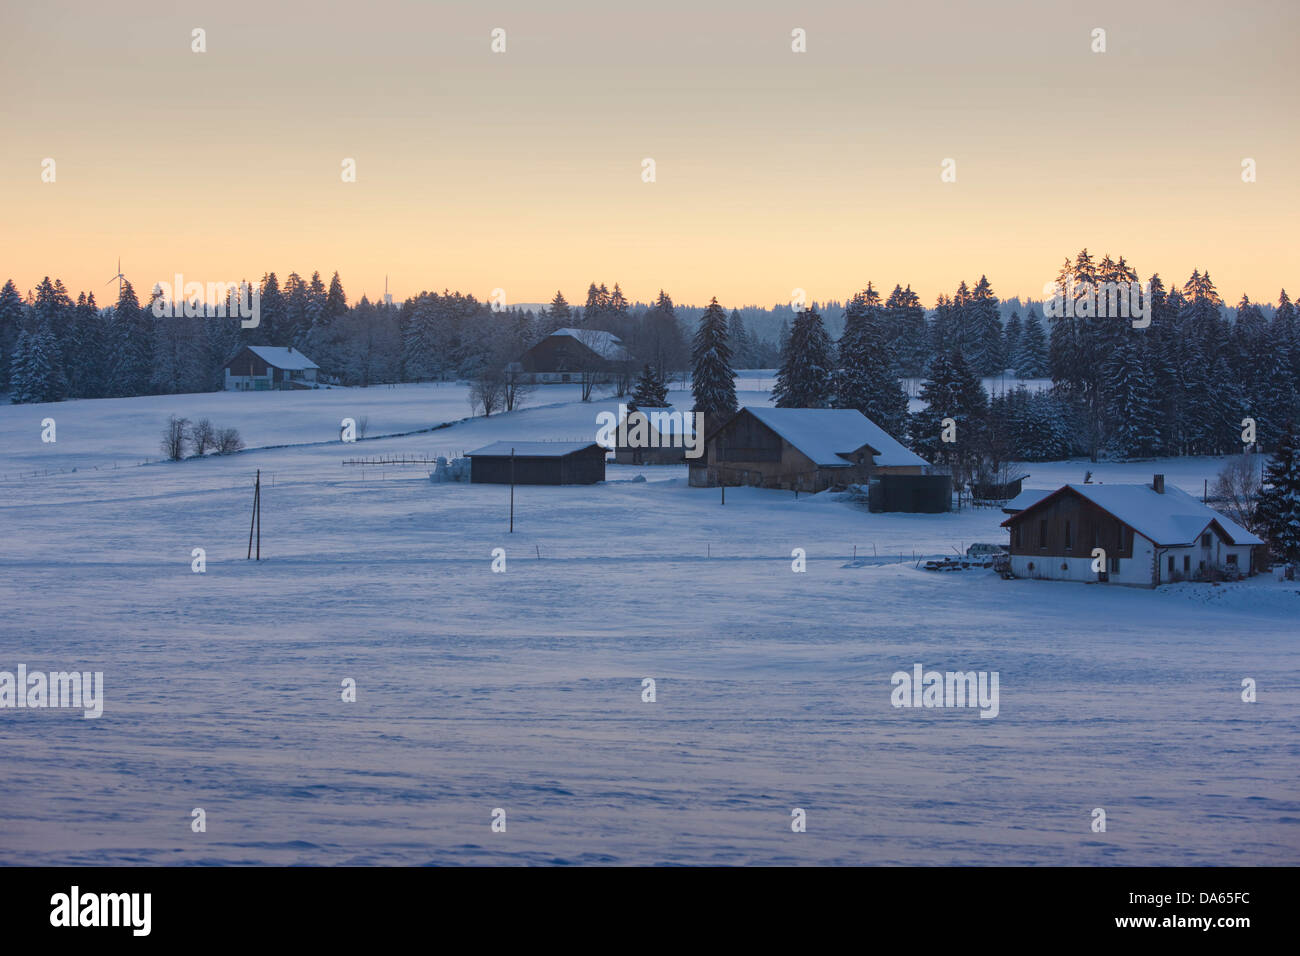 Morning mood, free mountains, farm, winter, snow, canton, JU, Jura, village, Switzerland, Europe, Les Bois - Stock Image